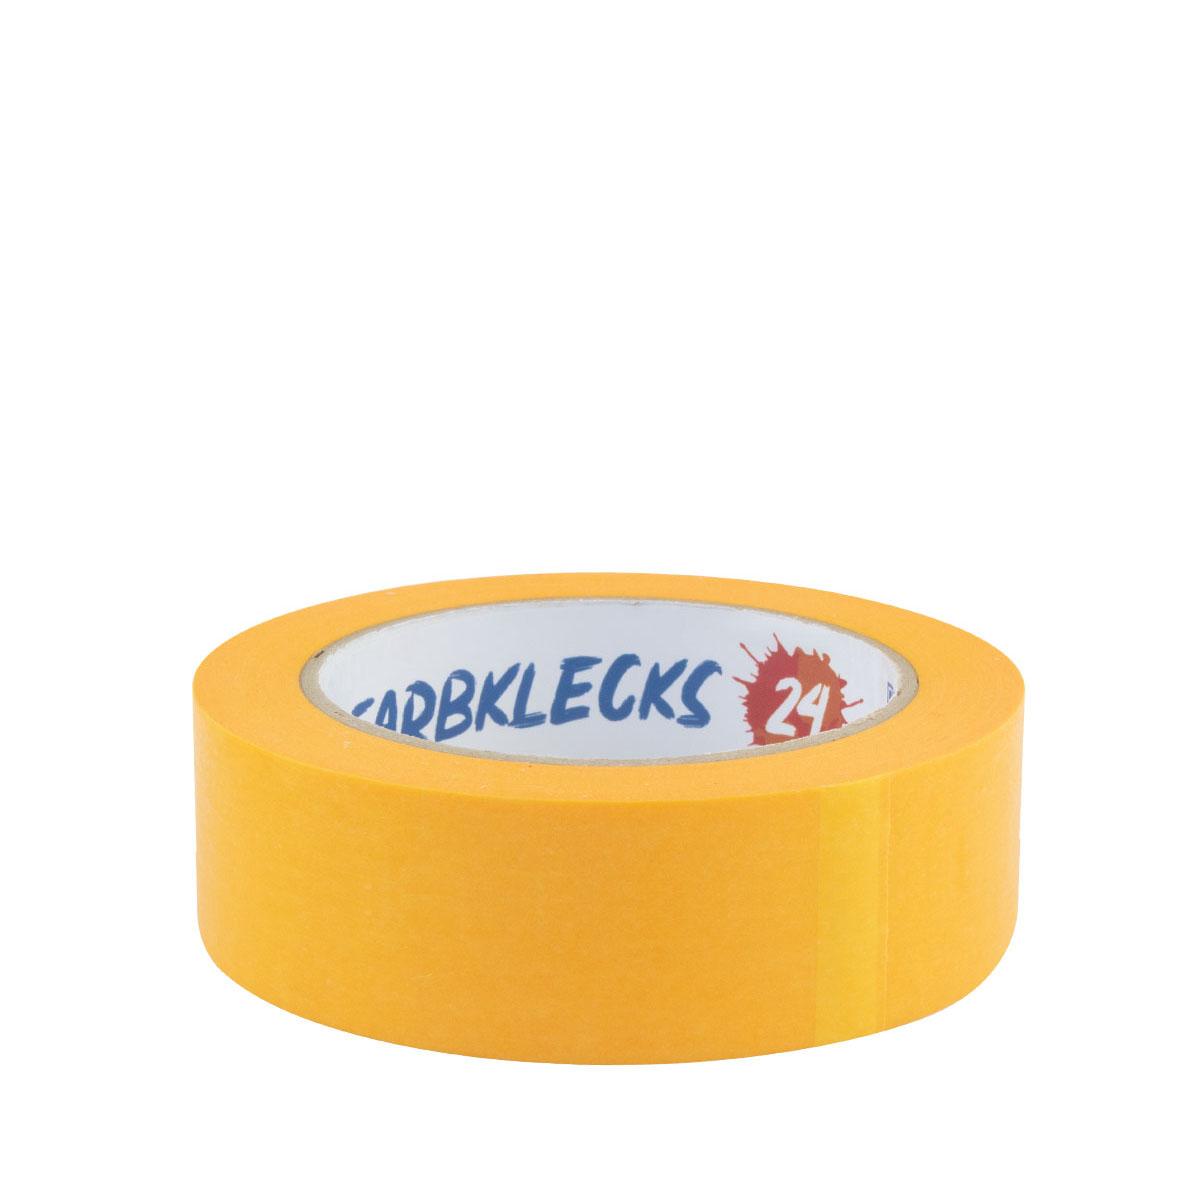 Farbklecks24 Klebeband Gold, Goldband 38mm